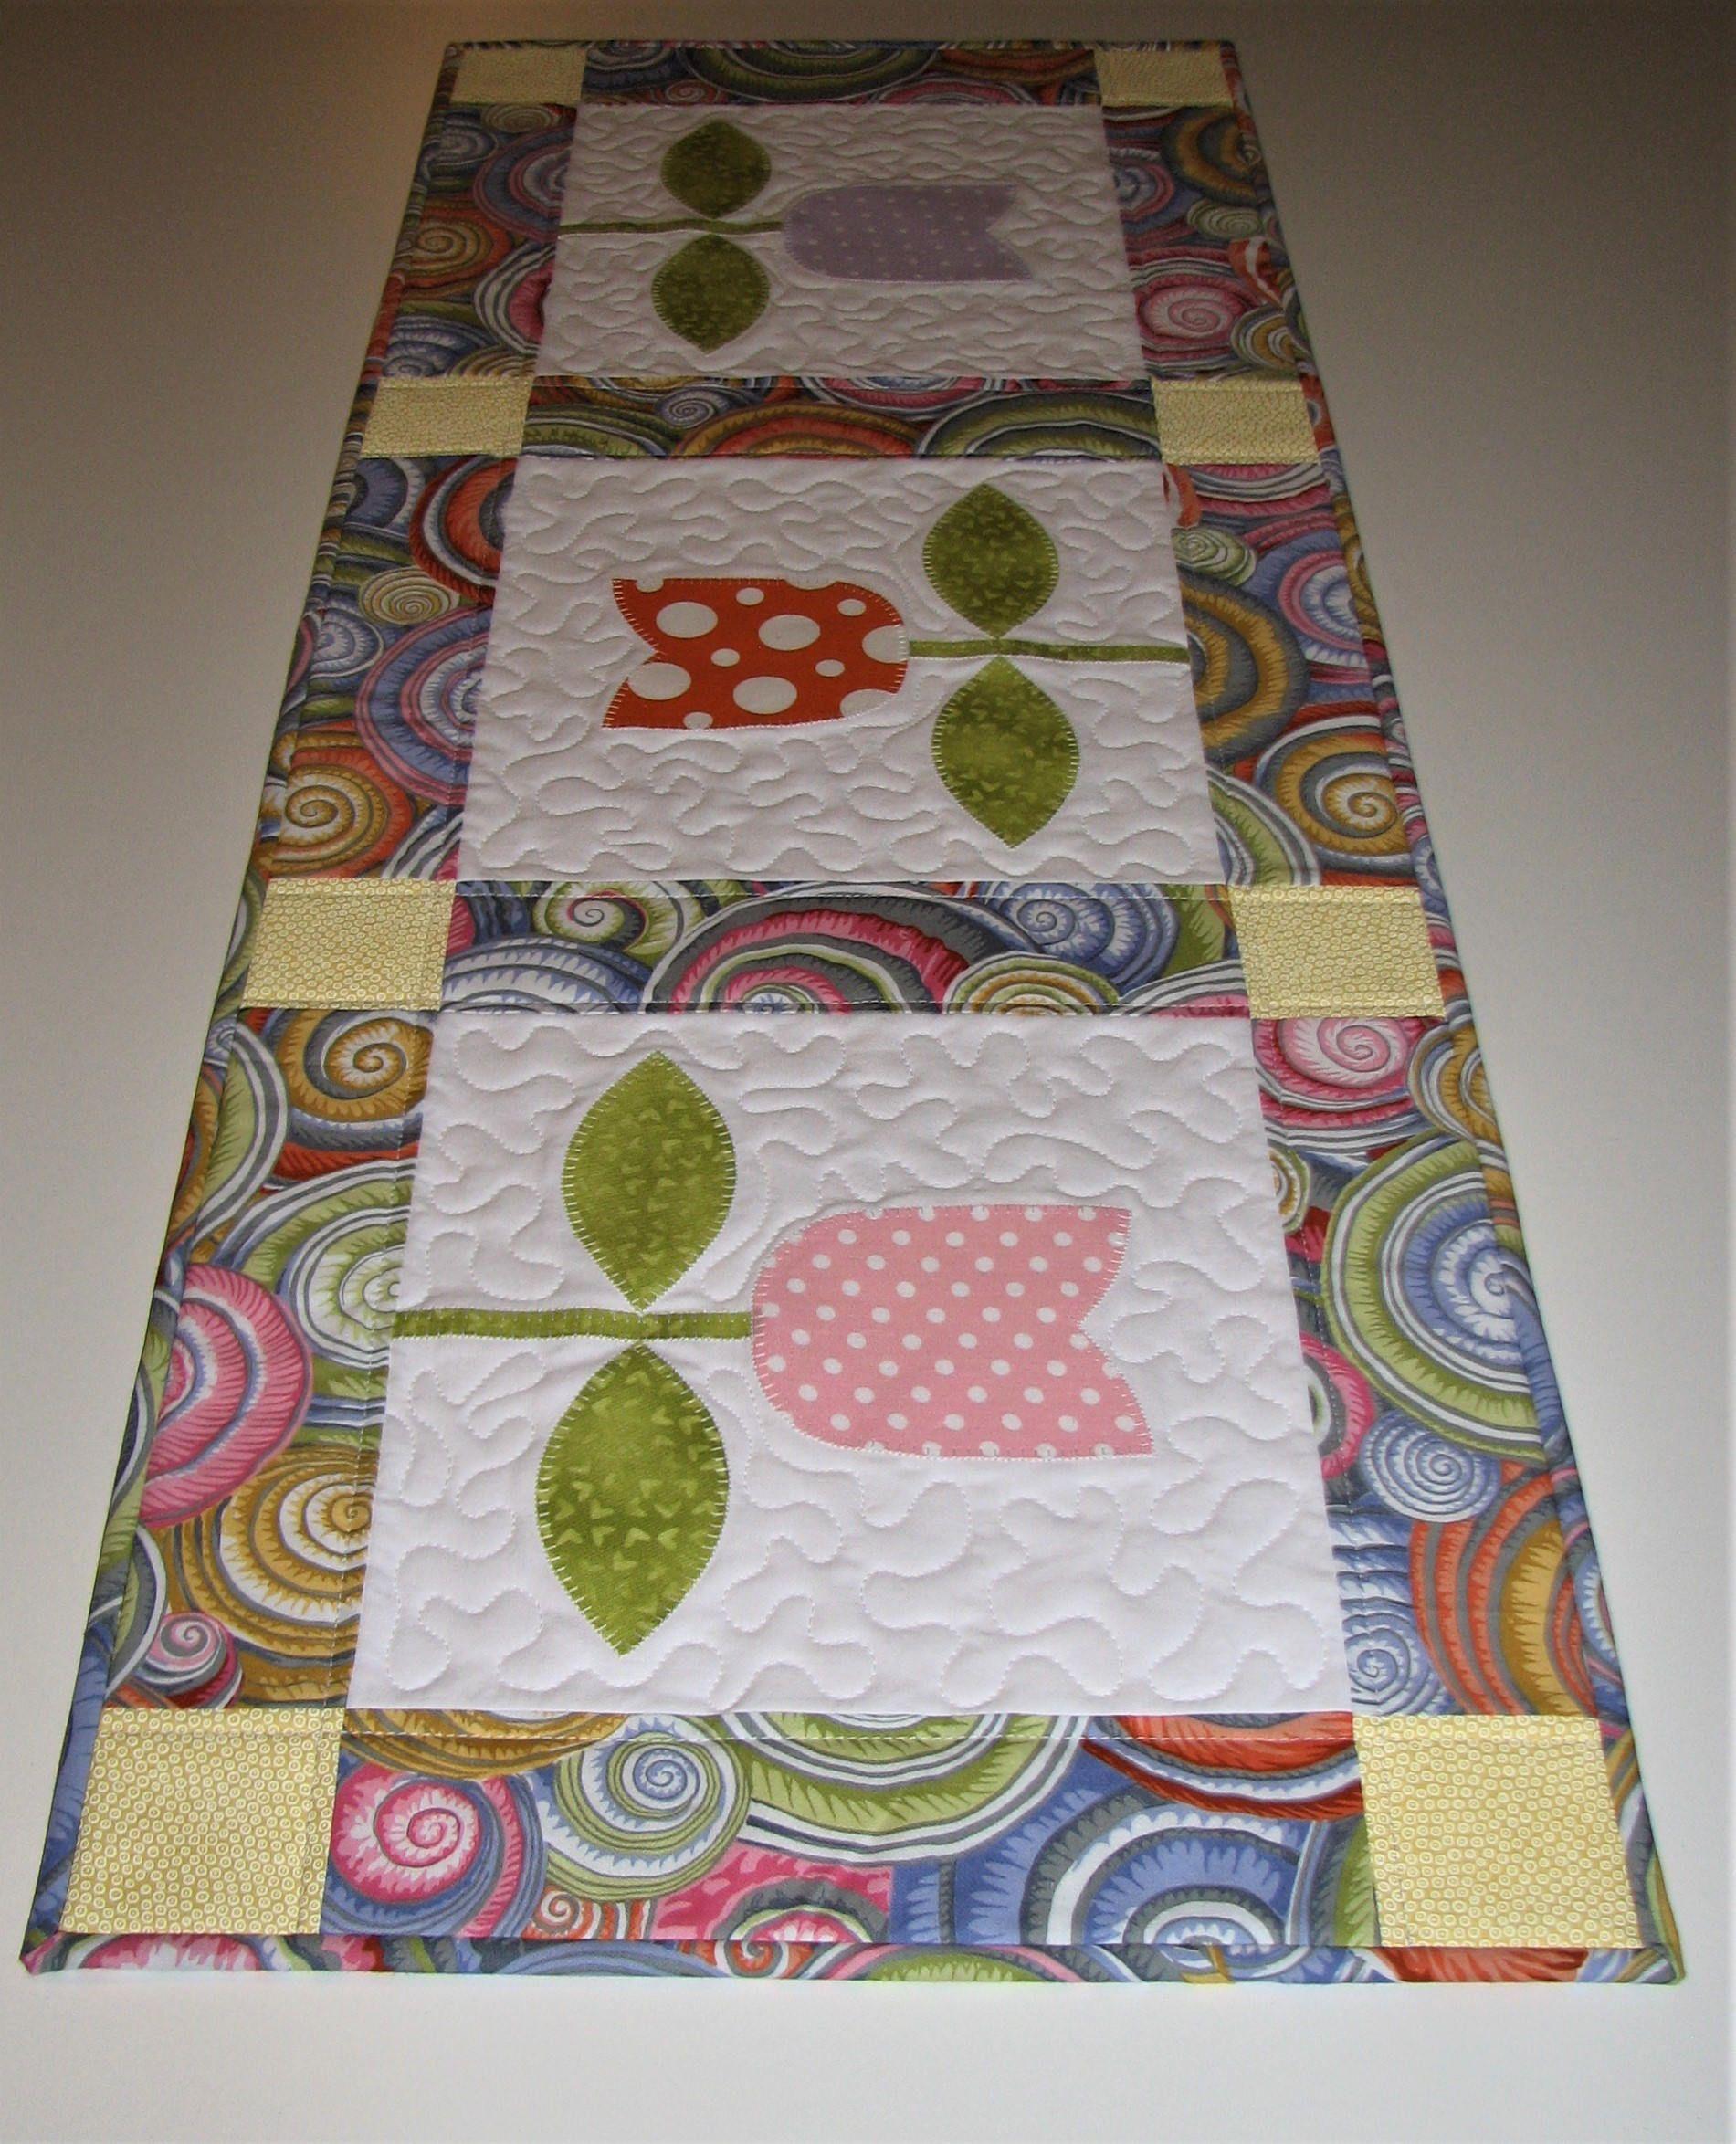 spring quilted table runner appliqued tulip table runner. Black Bedroom Furniture Sets. Home Design Ideas